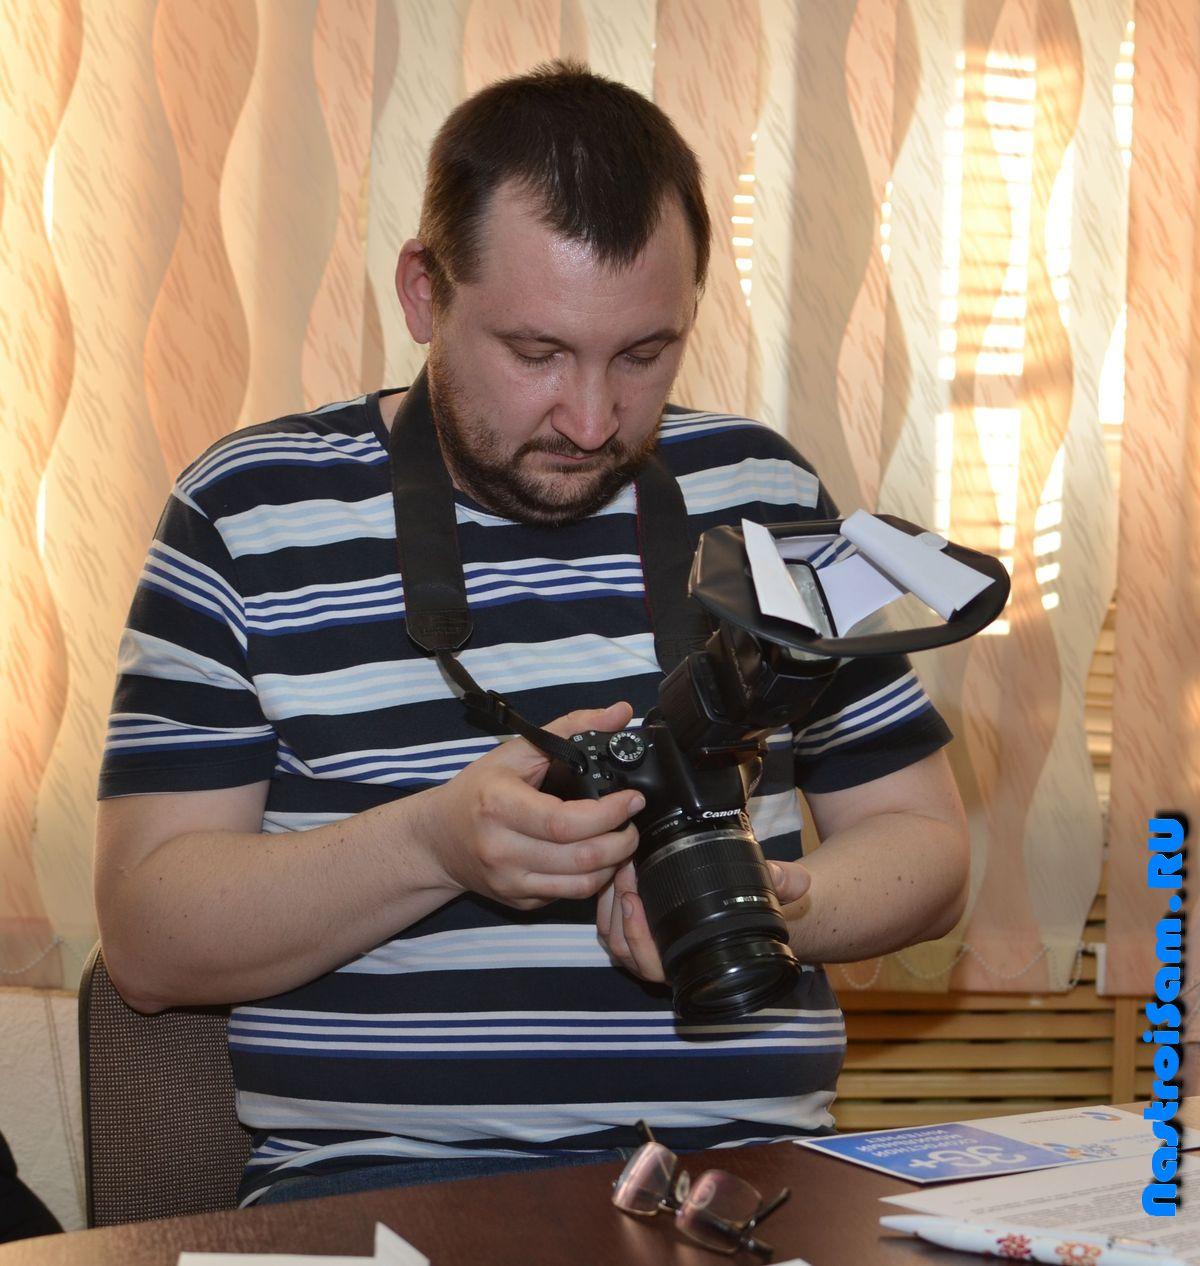 saratov_nss-3g_present-008